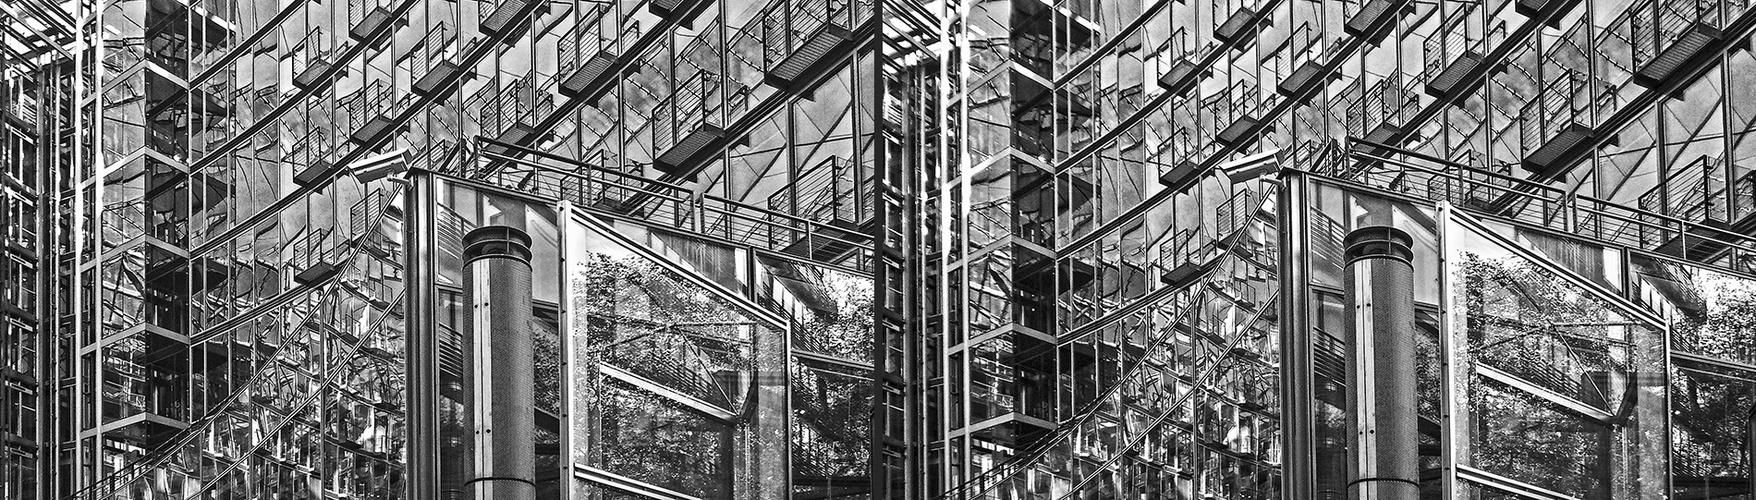 Kostenlos Parken Potsdamer Platz